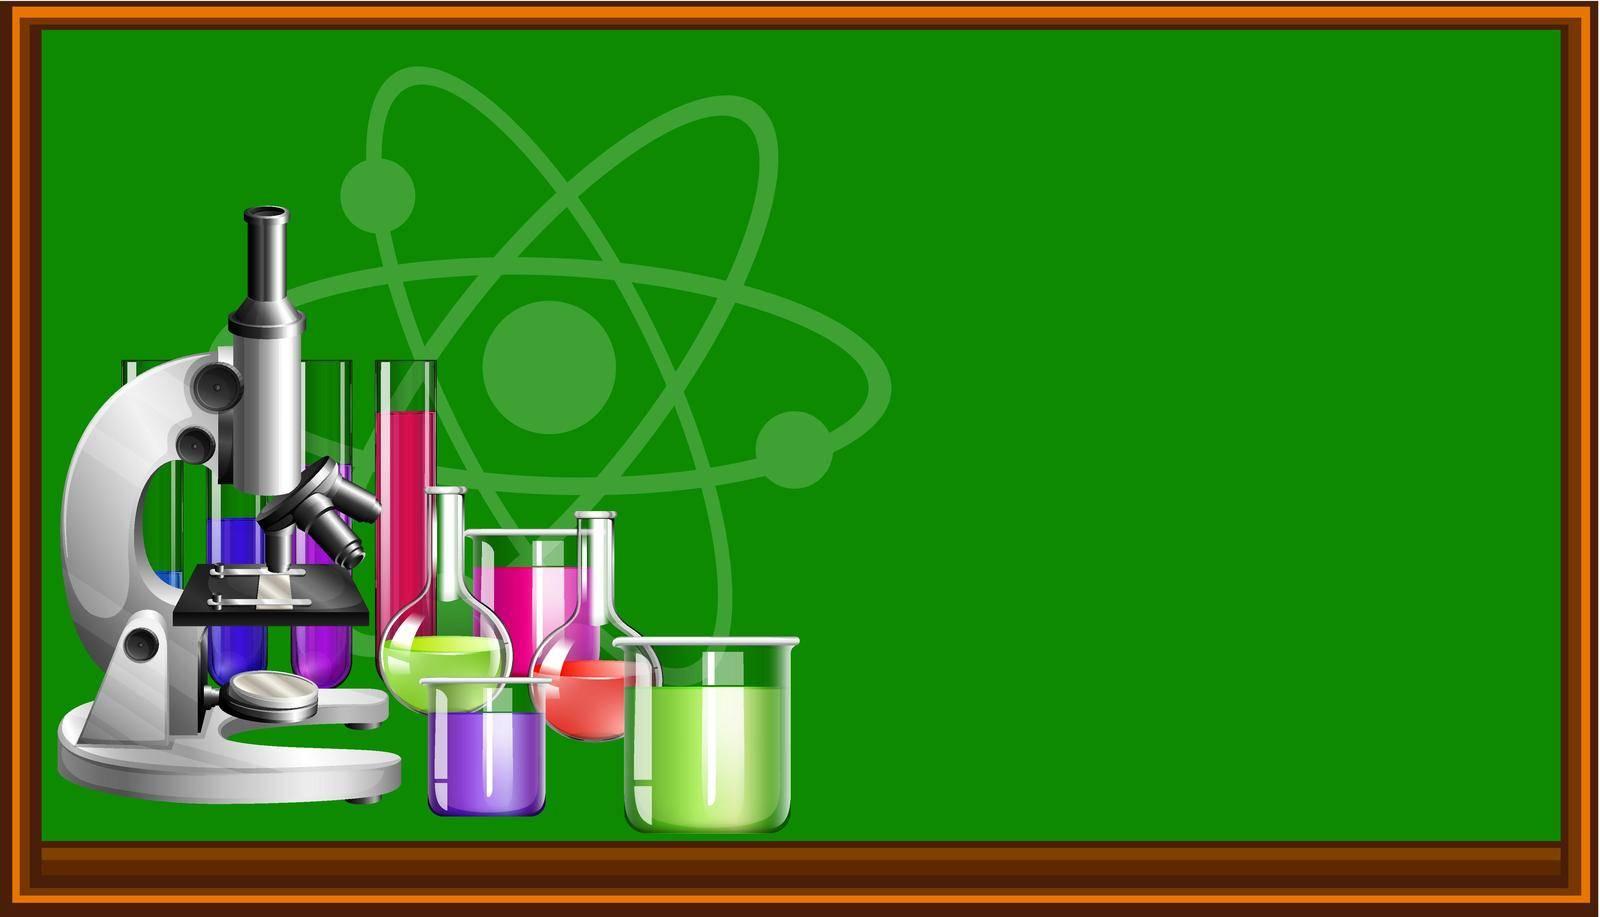 Science equipment and blackboard illustration